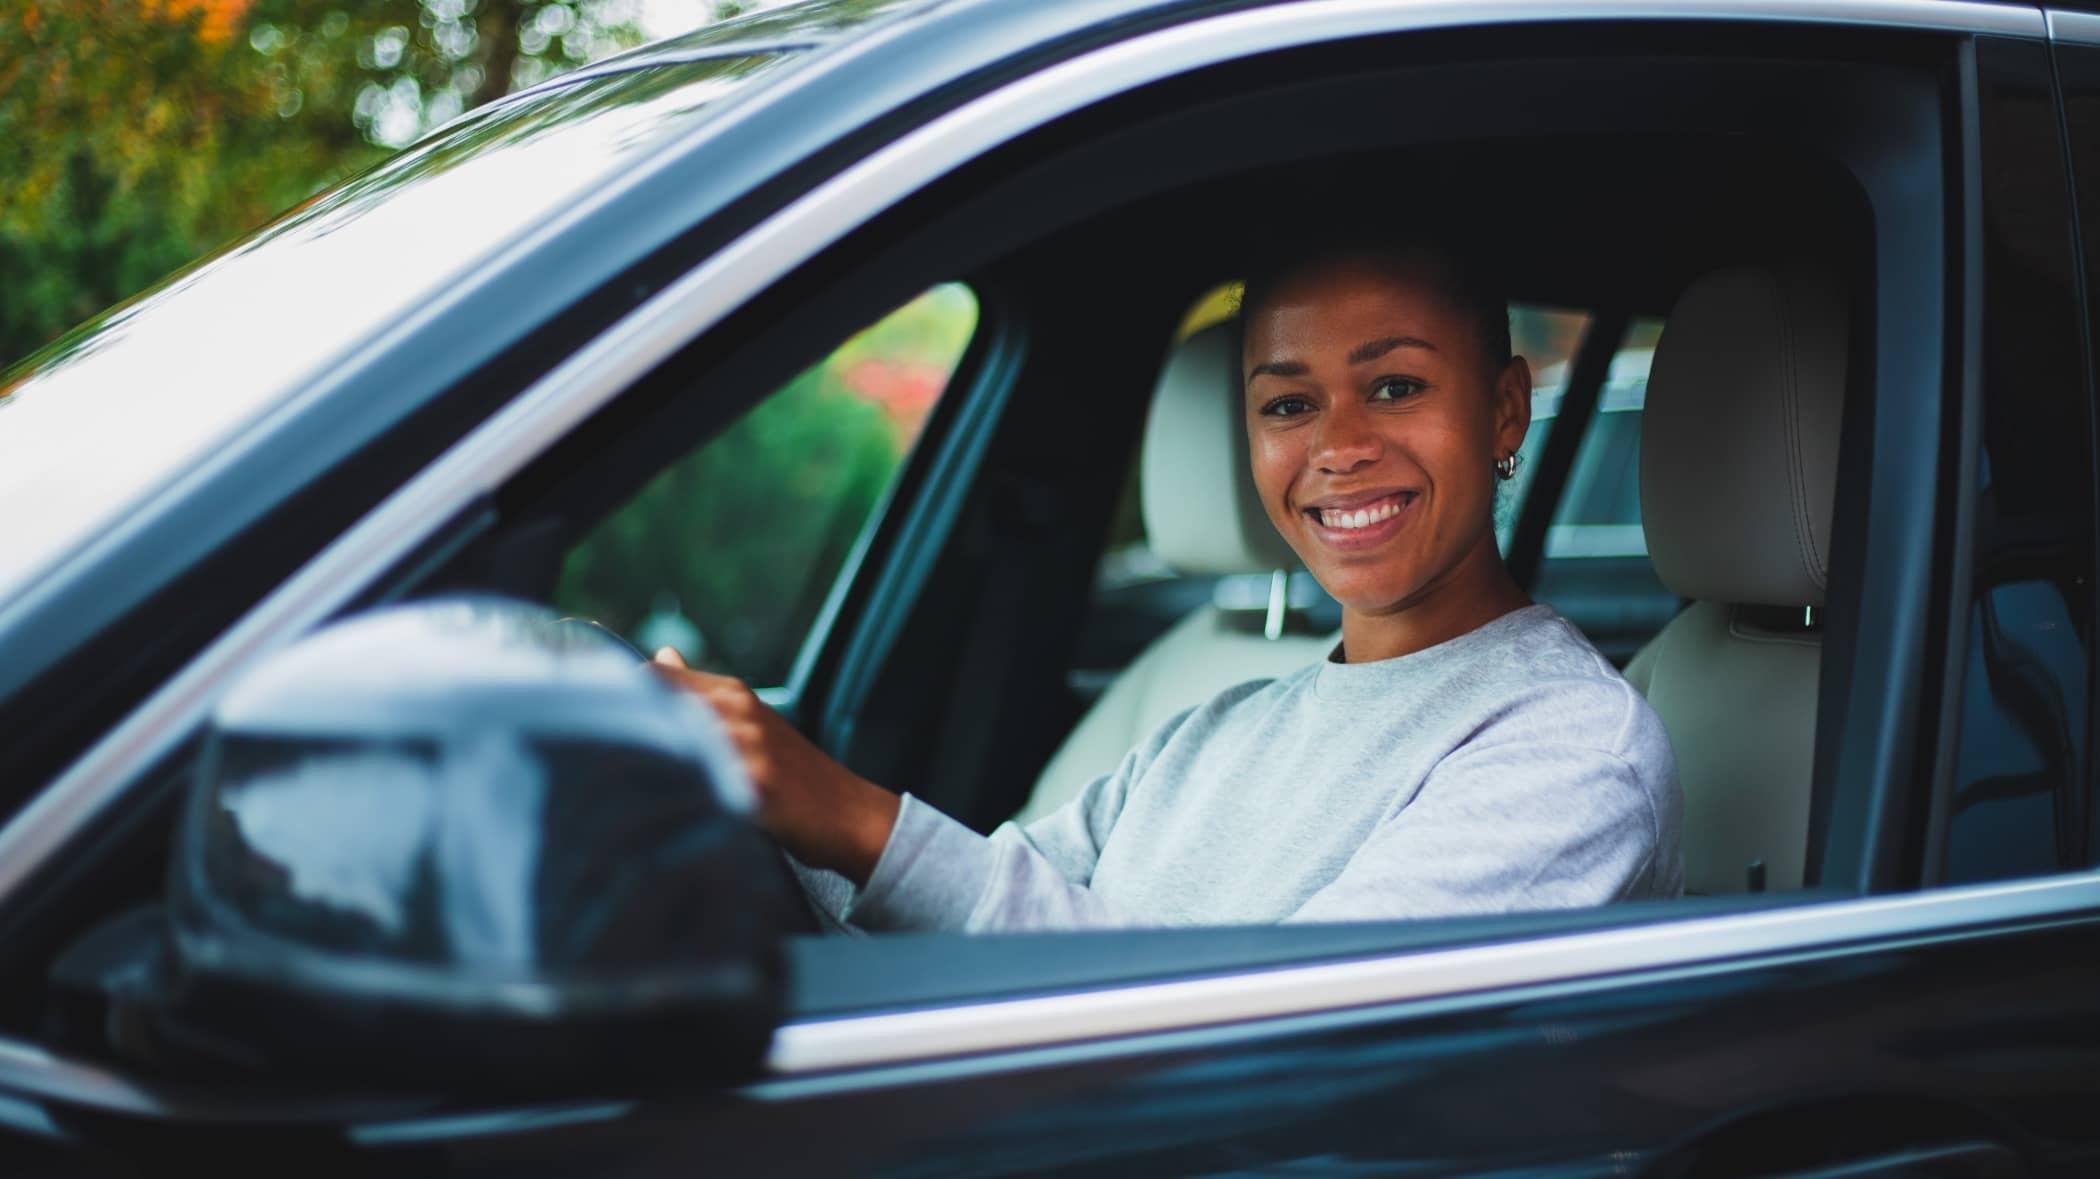 Luxury vehicle, Car, Driving